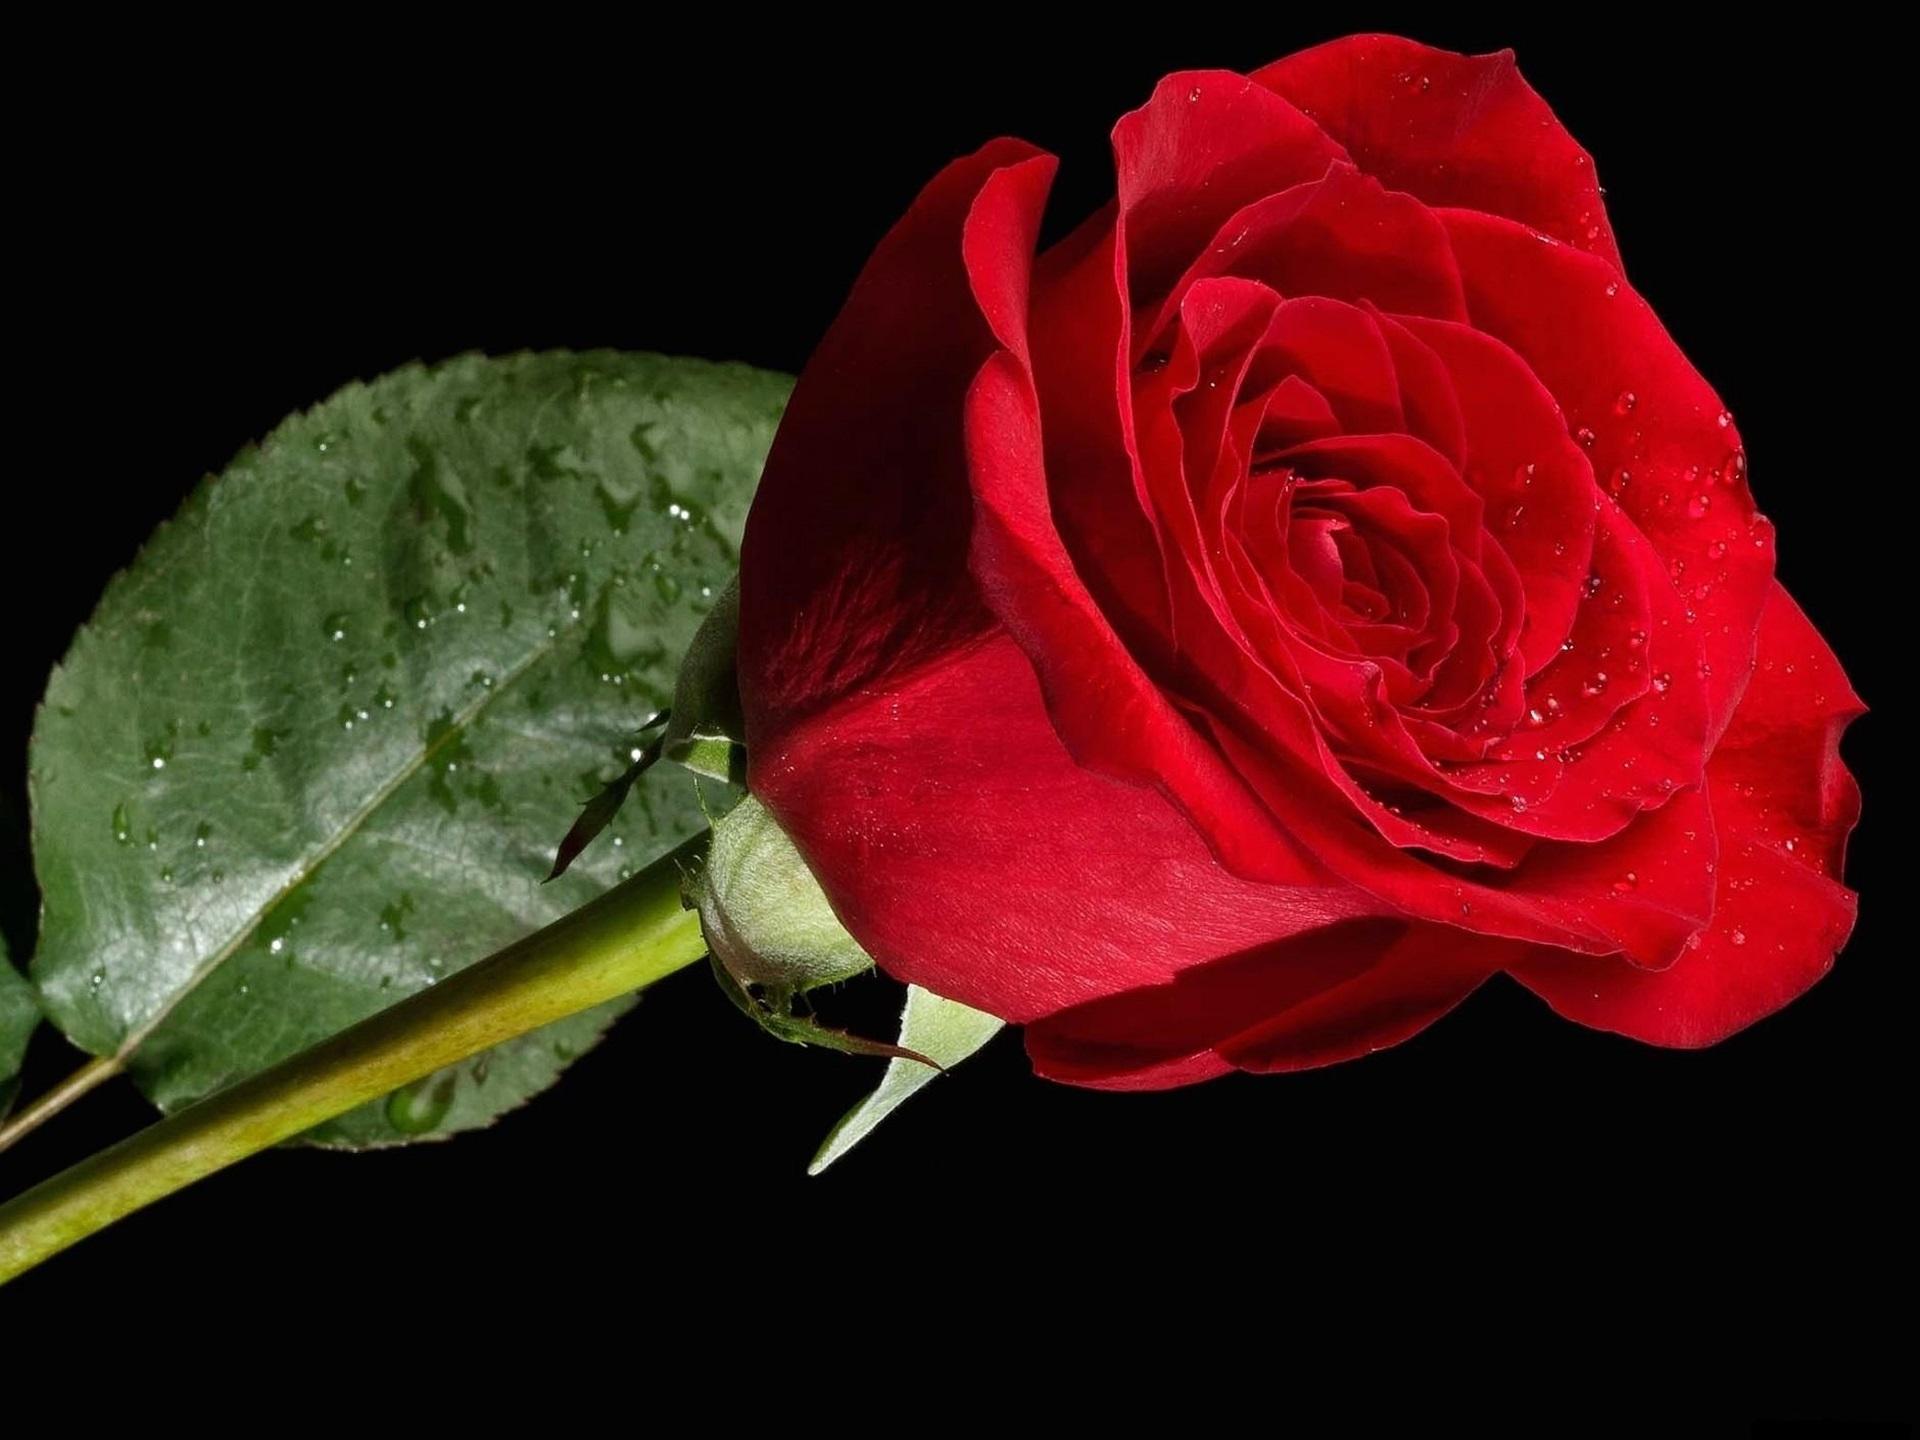 Wallpaper Single Red Rose Flower Water Drops 1920x1200 Hd: Wallpaper One Red Rose, Water Drops, Black Background